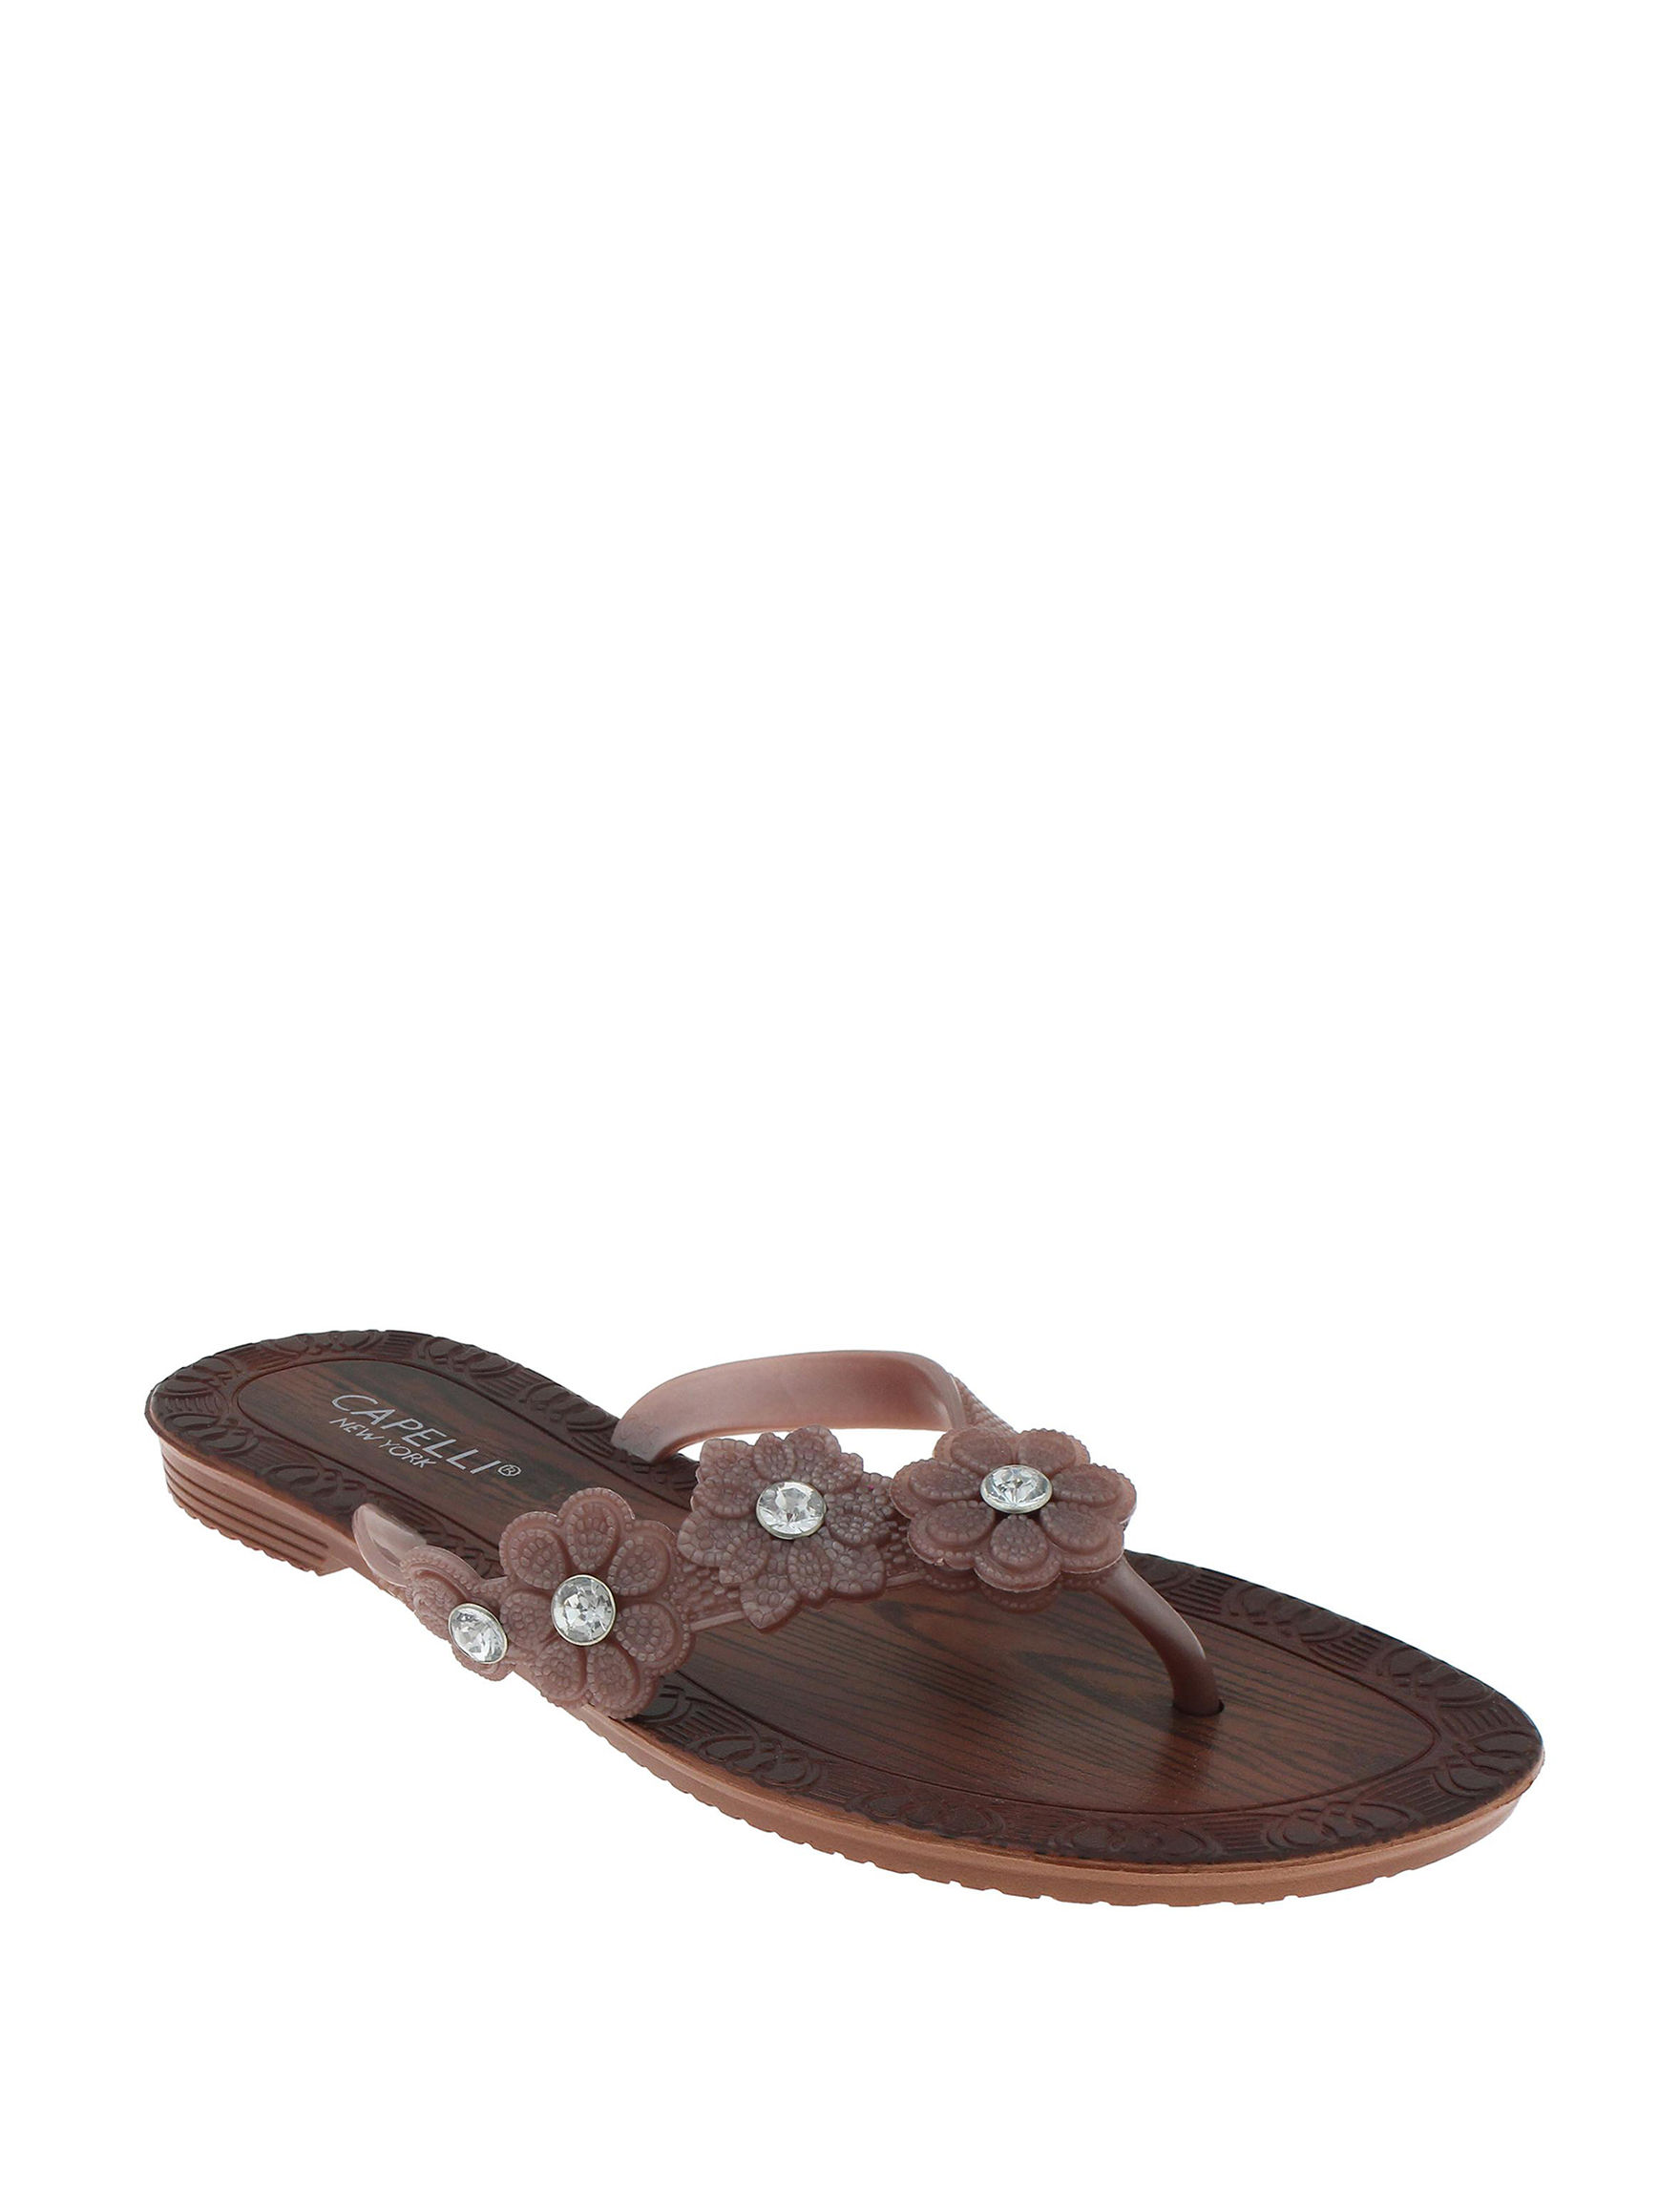 Capelli Rose Gold Flat Sandals